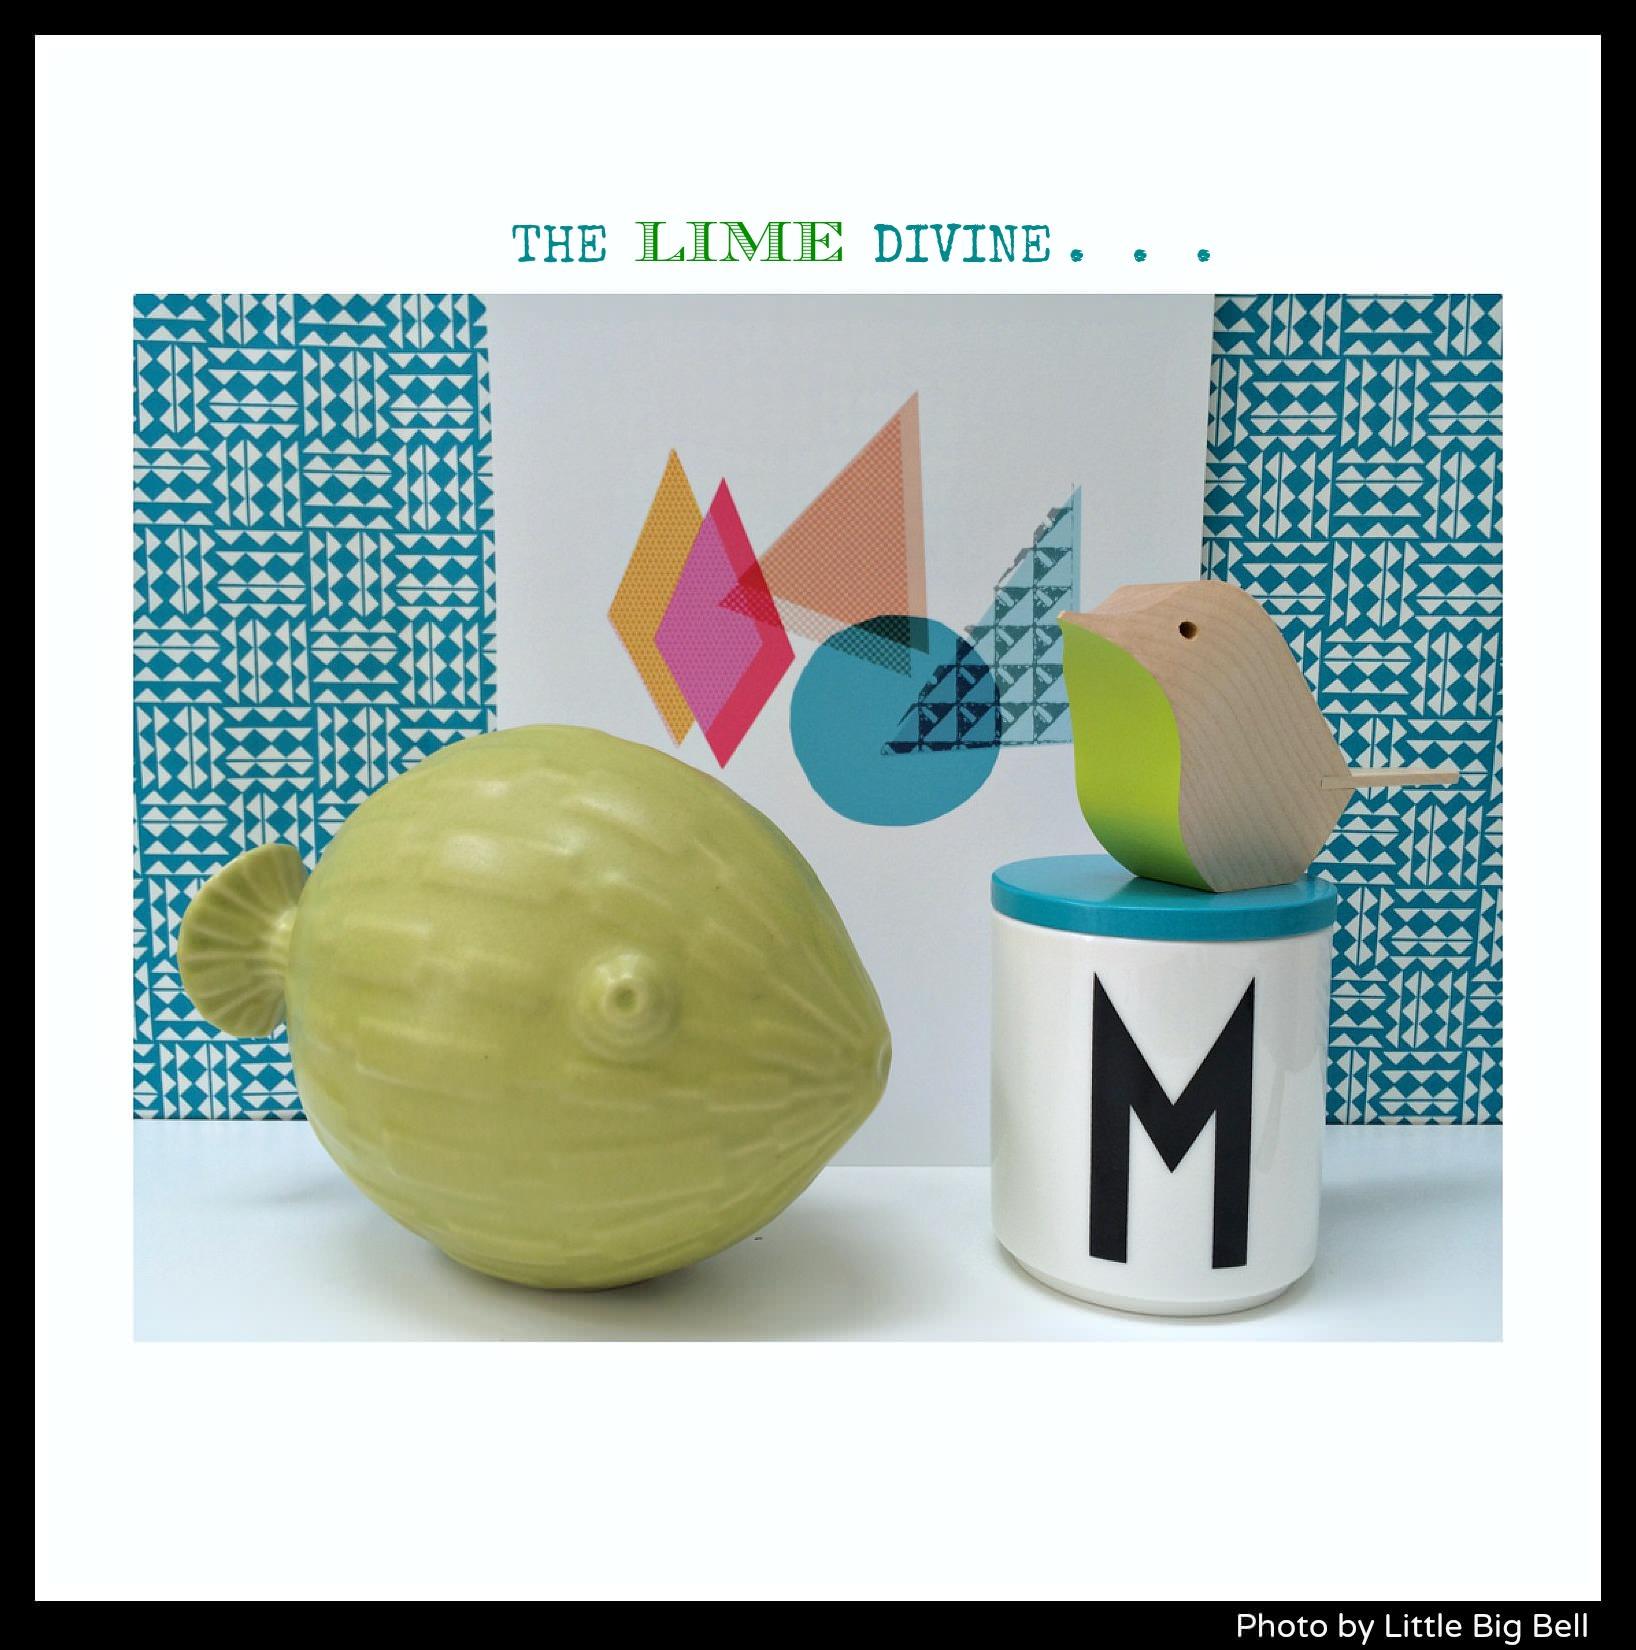 Bright-Bazaar-the-Lime-Divine-styling-by-Geraldine-Little-Big-Bell.jpg.jpg